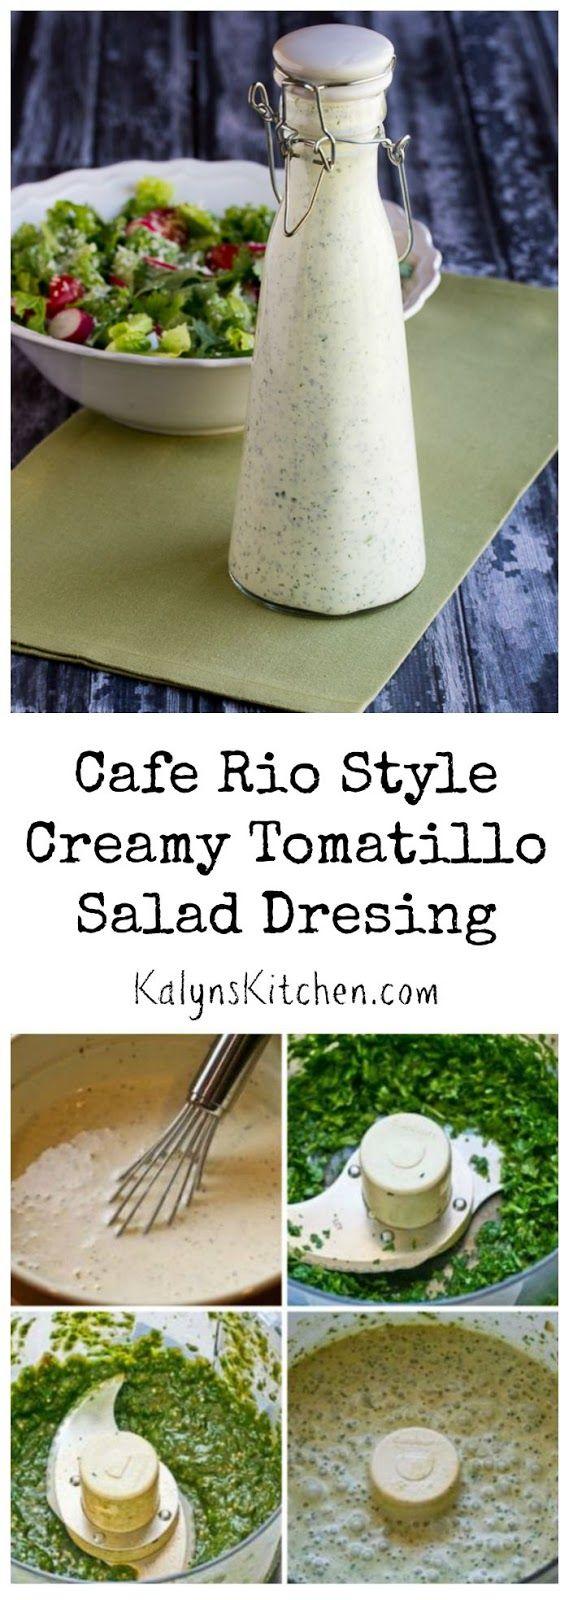 Cafe Rio Style Creamy Tomatillo Salad Dressing